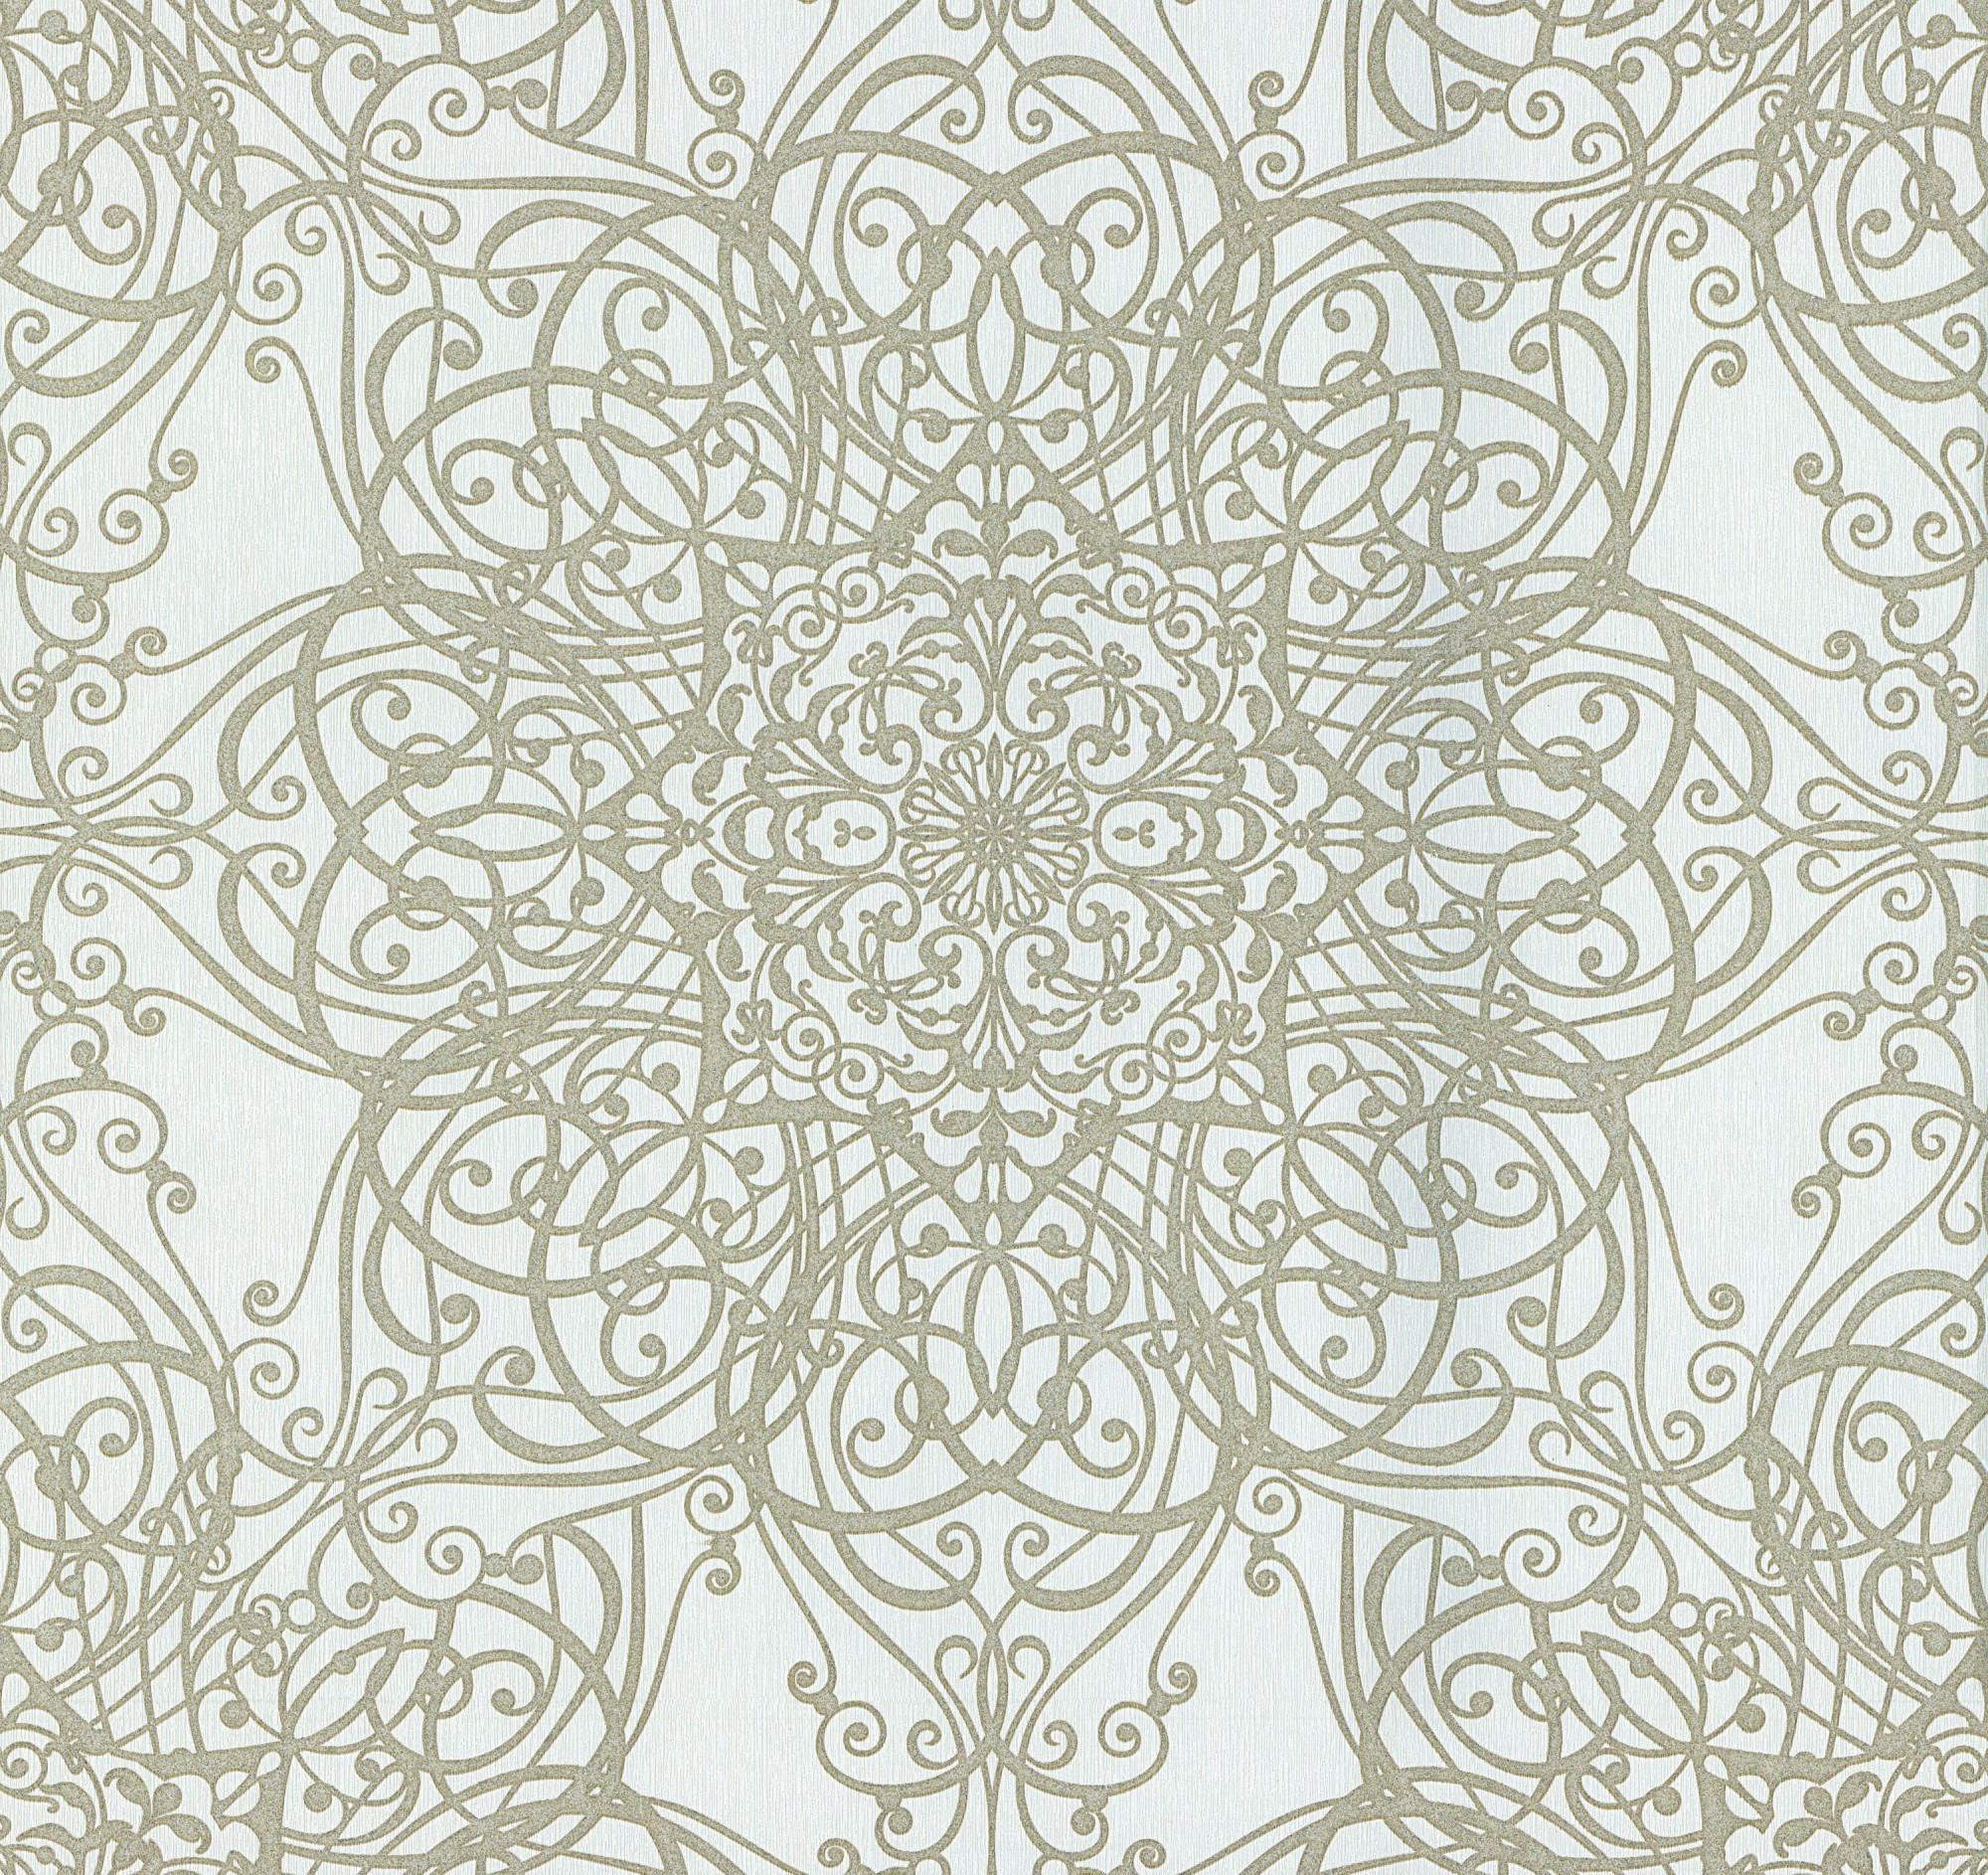 guido maria kretschmer tapete creme ornament 02465 20. Black Bedroom Furniture Sets. Home Design Ideas